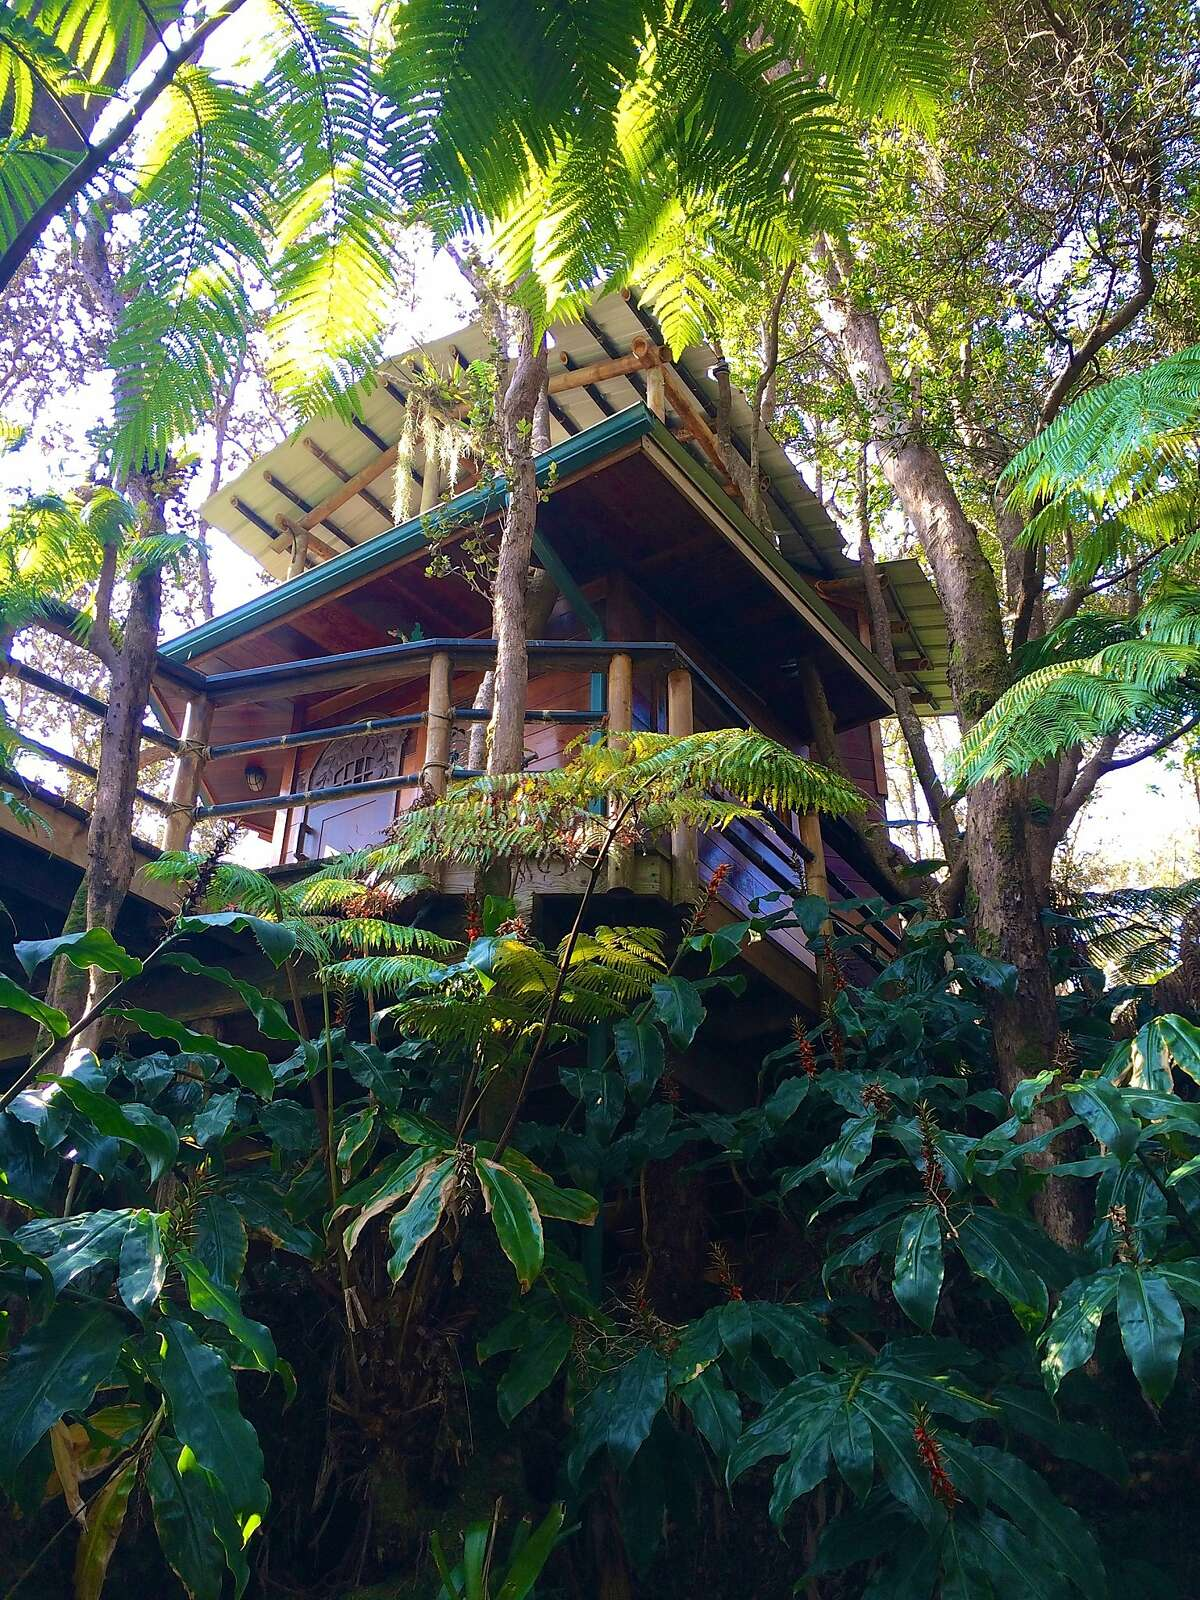 Gail Armand, a Marin native and 1972 Cal alumna, and husband Robert van Sluis opened the sustainably built, custom-designed Mahinui Na Lani (